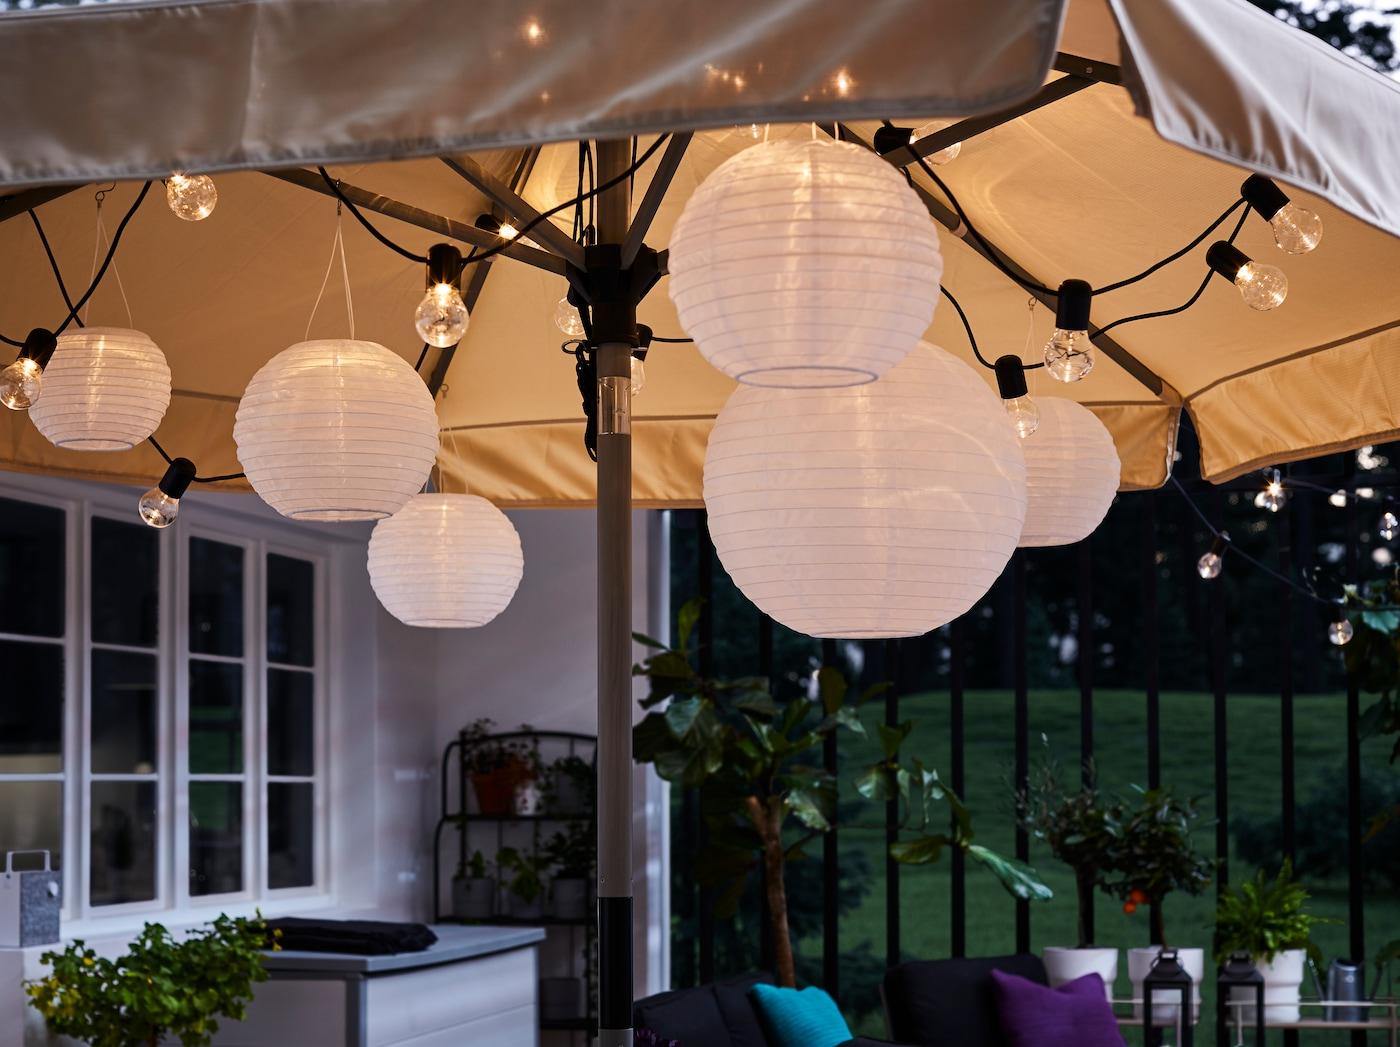 7 ideas para decorar tu terraza con farolillos IKEA